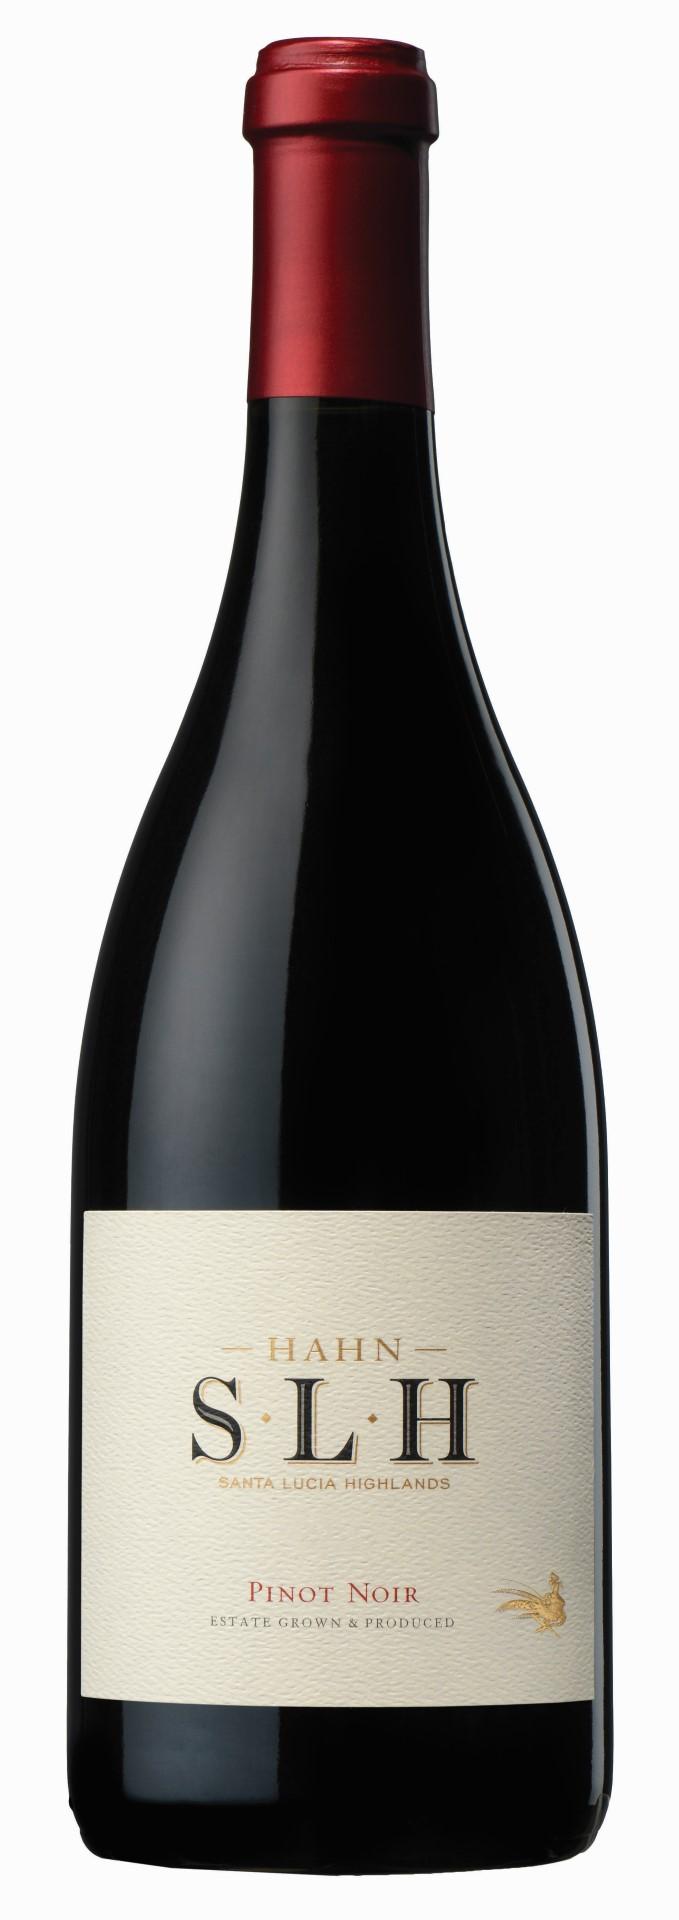 2015 Hahn SLH Pinot Noir Santa Lucia Highands